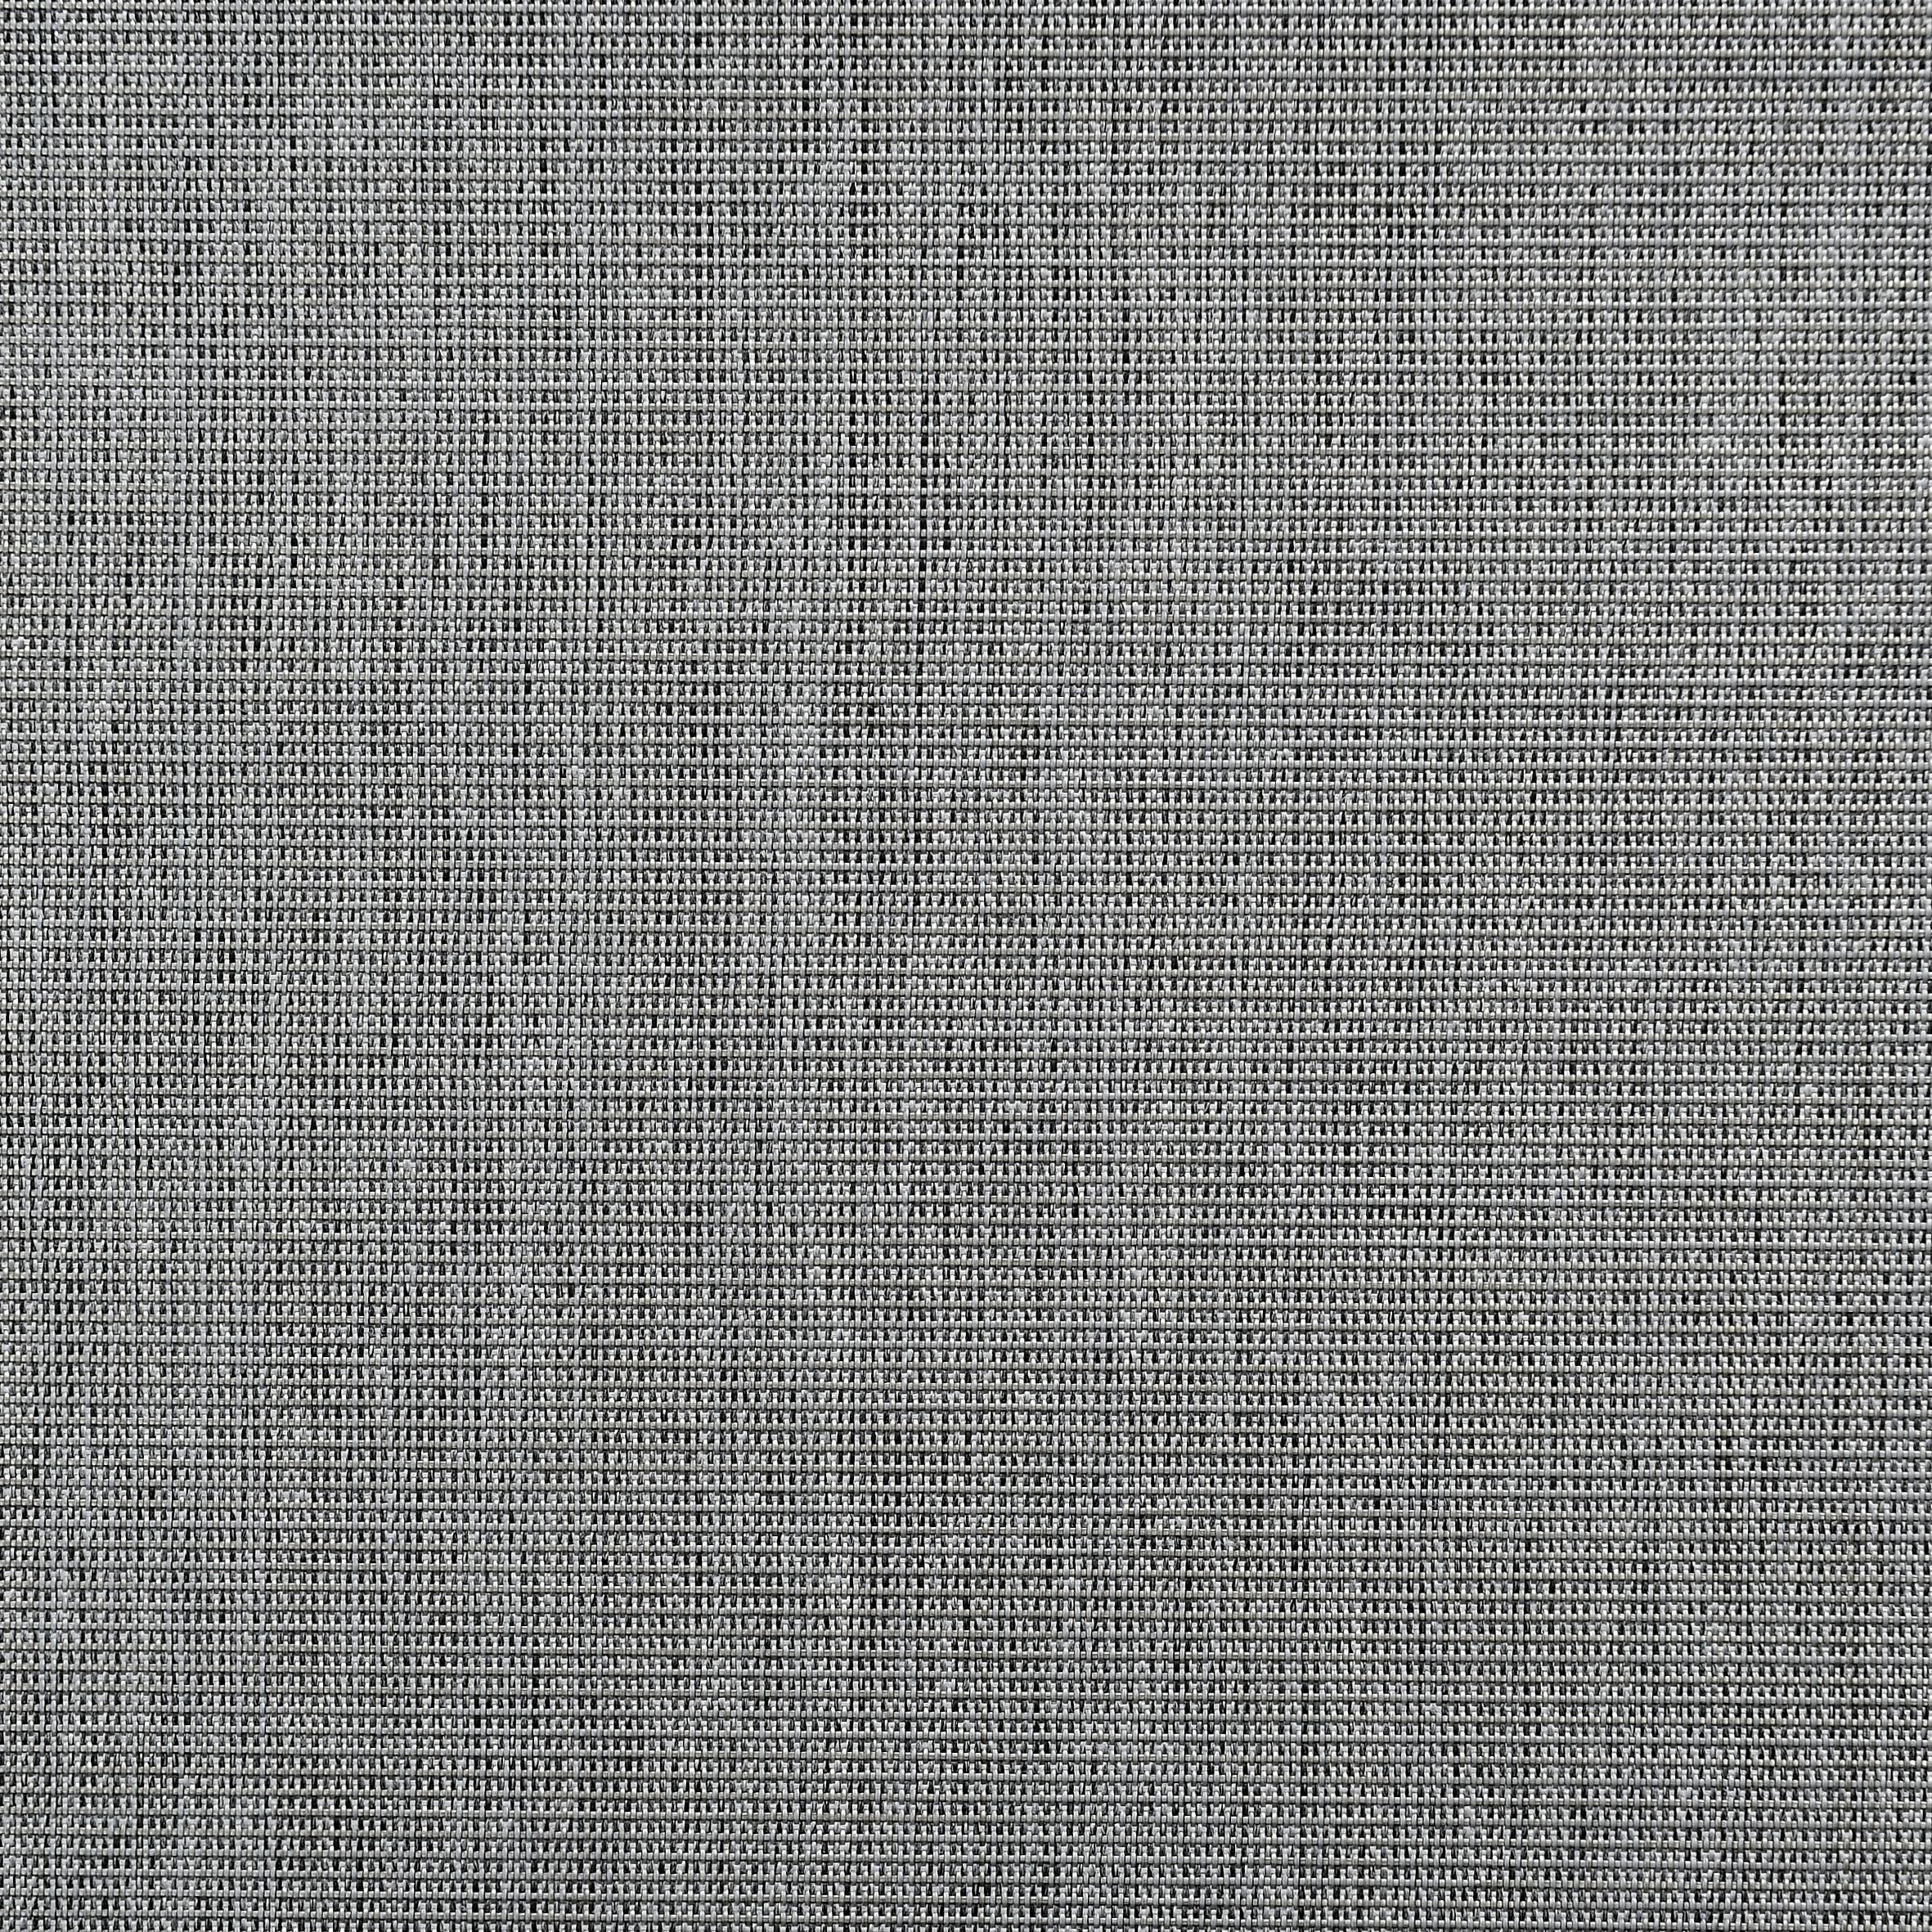 Gartenstuhl ESPANYOL (1 Stk) 02